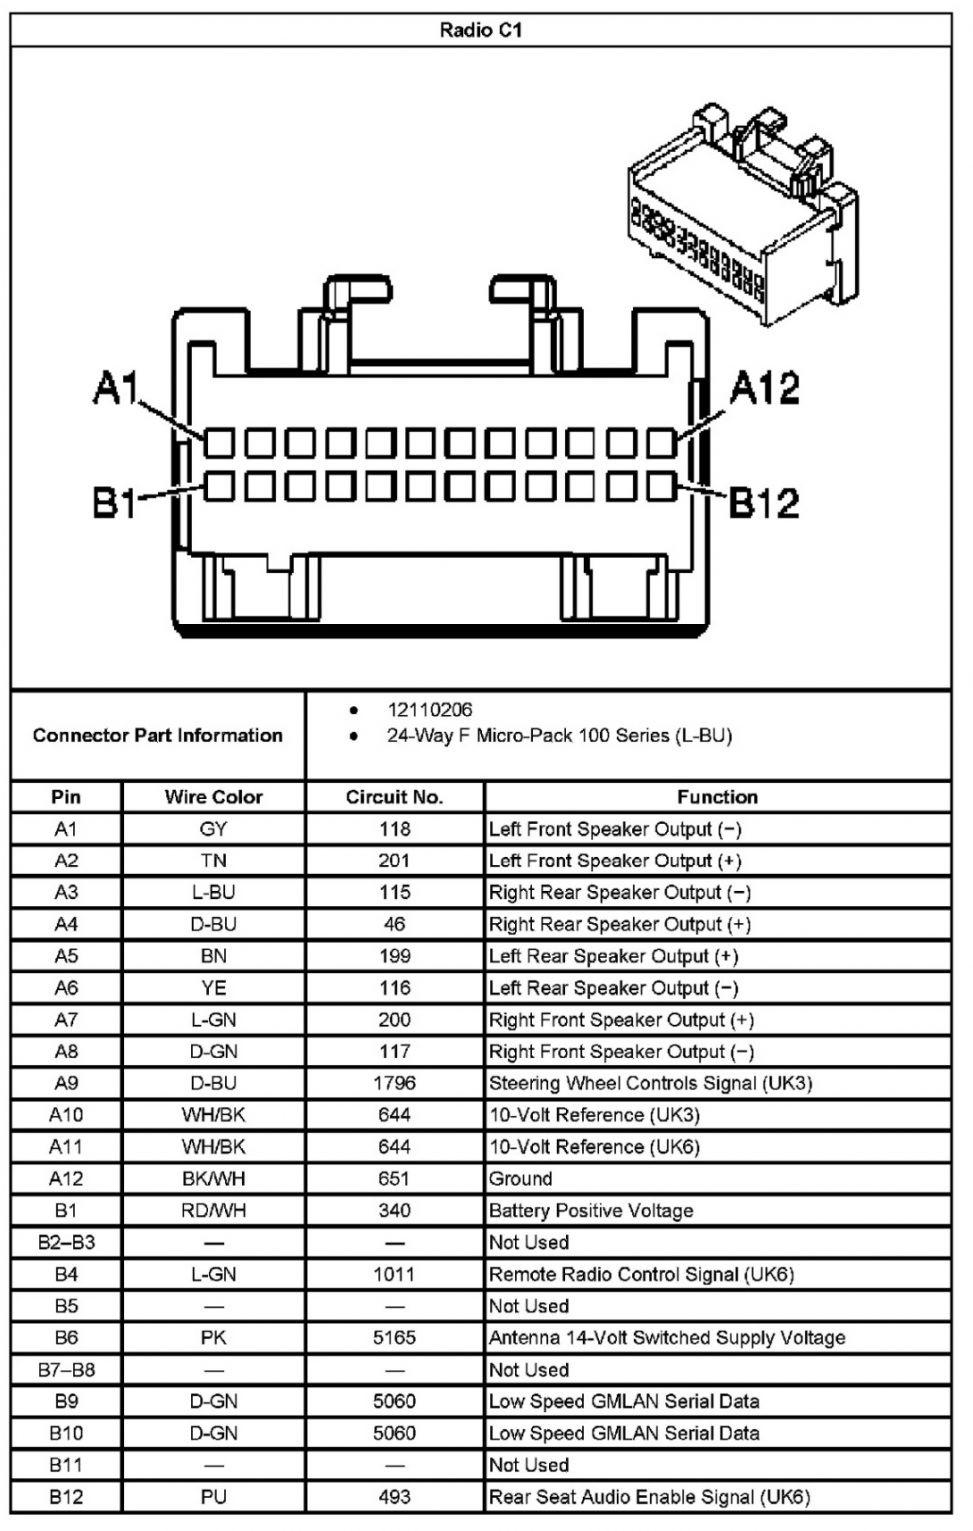 medium resolution of 2004 chevy malibu radio wiring diagram 2005 chevy malibu classic stereo wiring diagram wire center